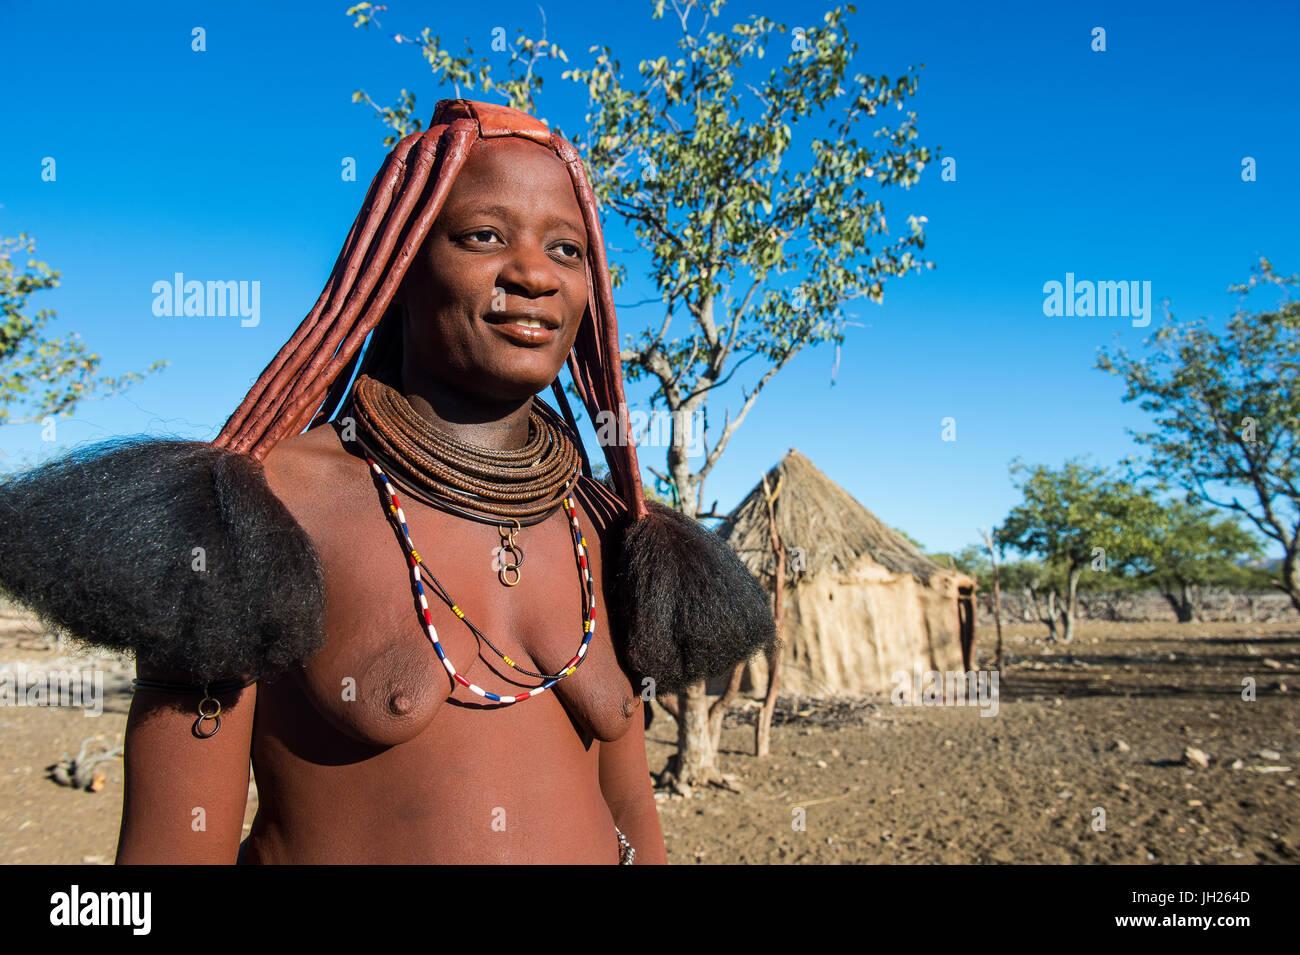 Himba woman, Sesriem, Kaokoveld, Namibia, Africa - Stock Image